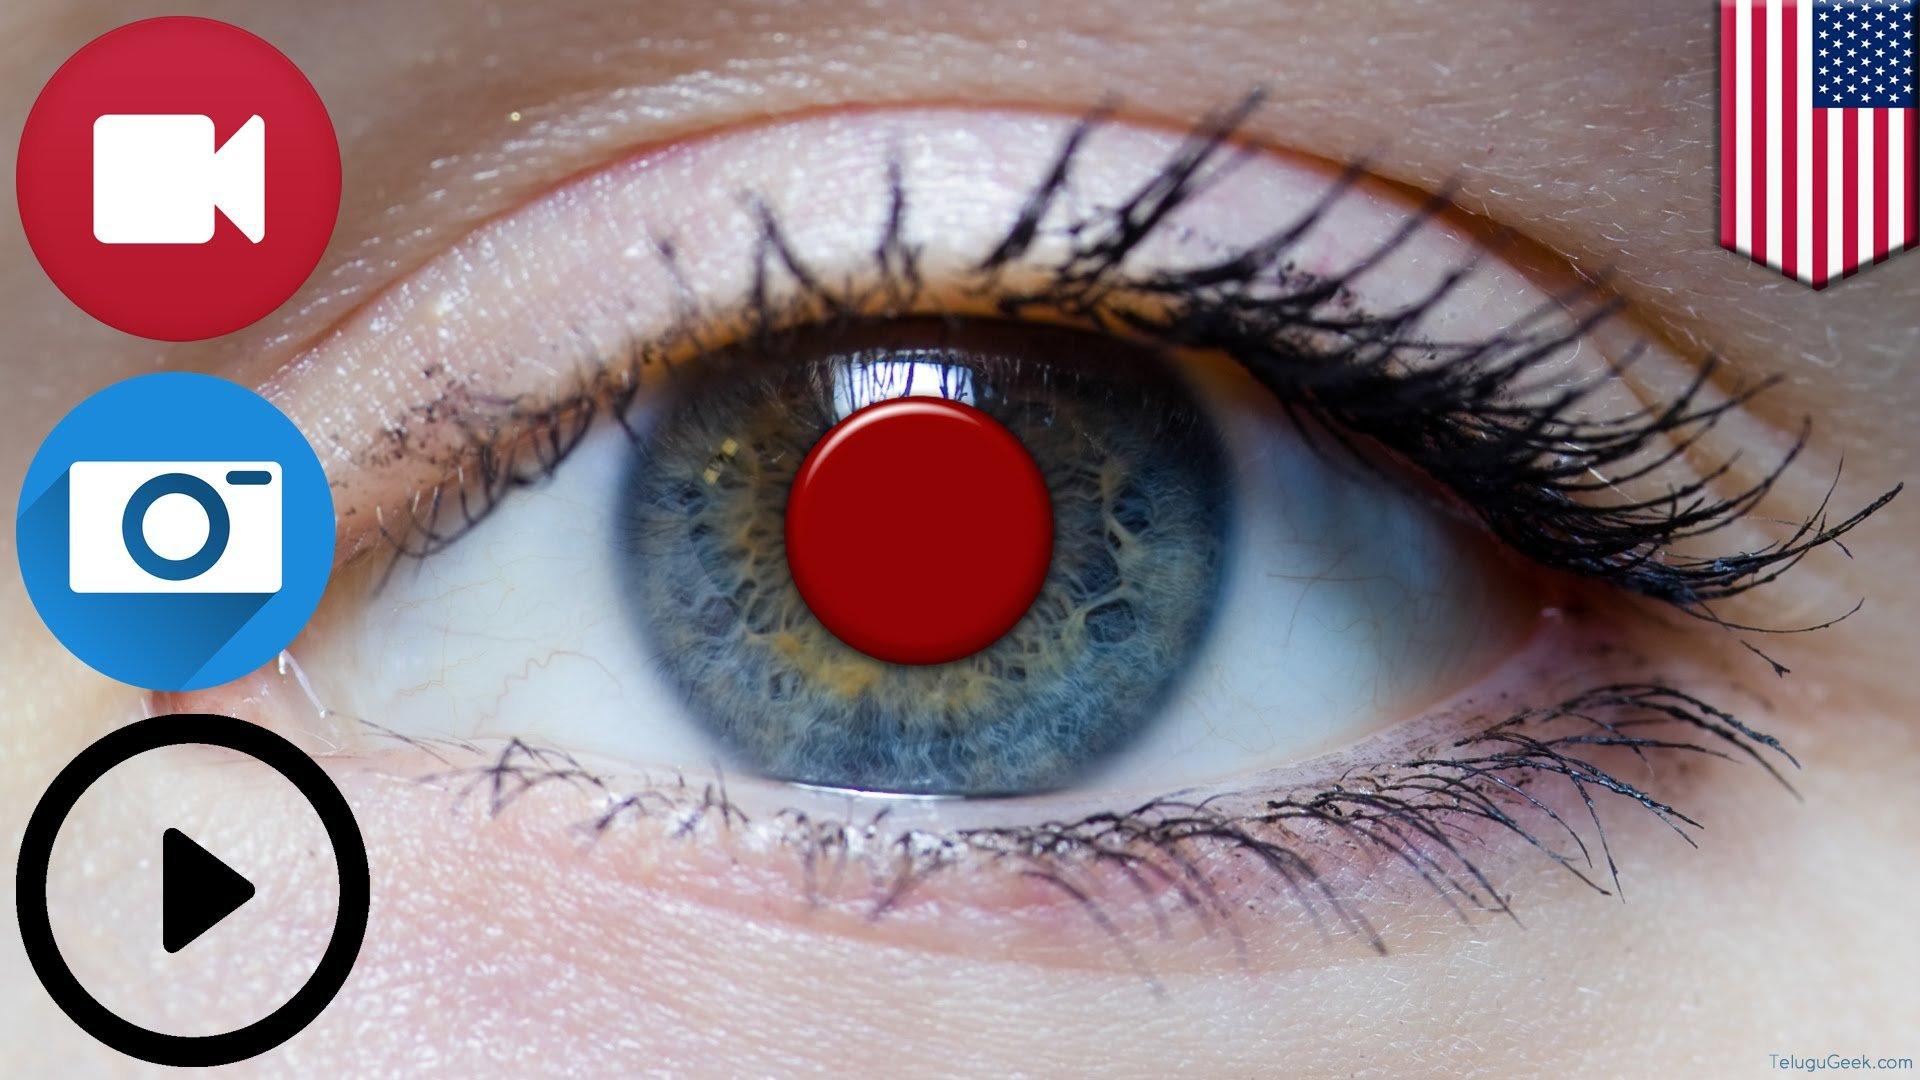 Sony smart contact lens రెప్ప పాటు ద్వారా ఫోటో, వీడియో తీయగలదు